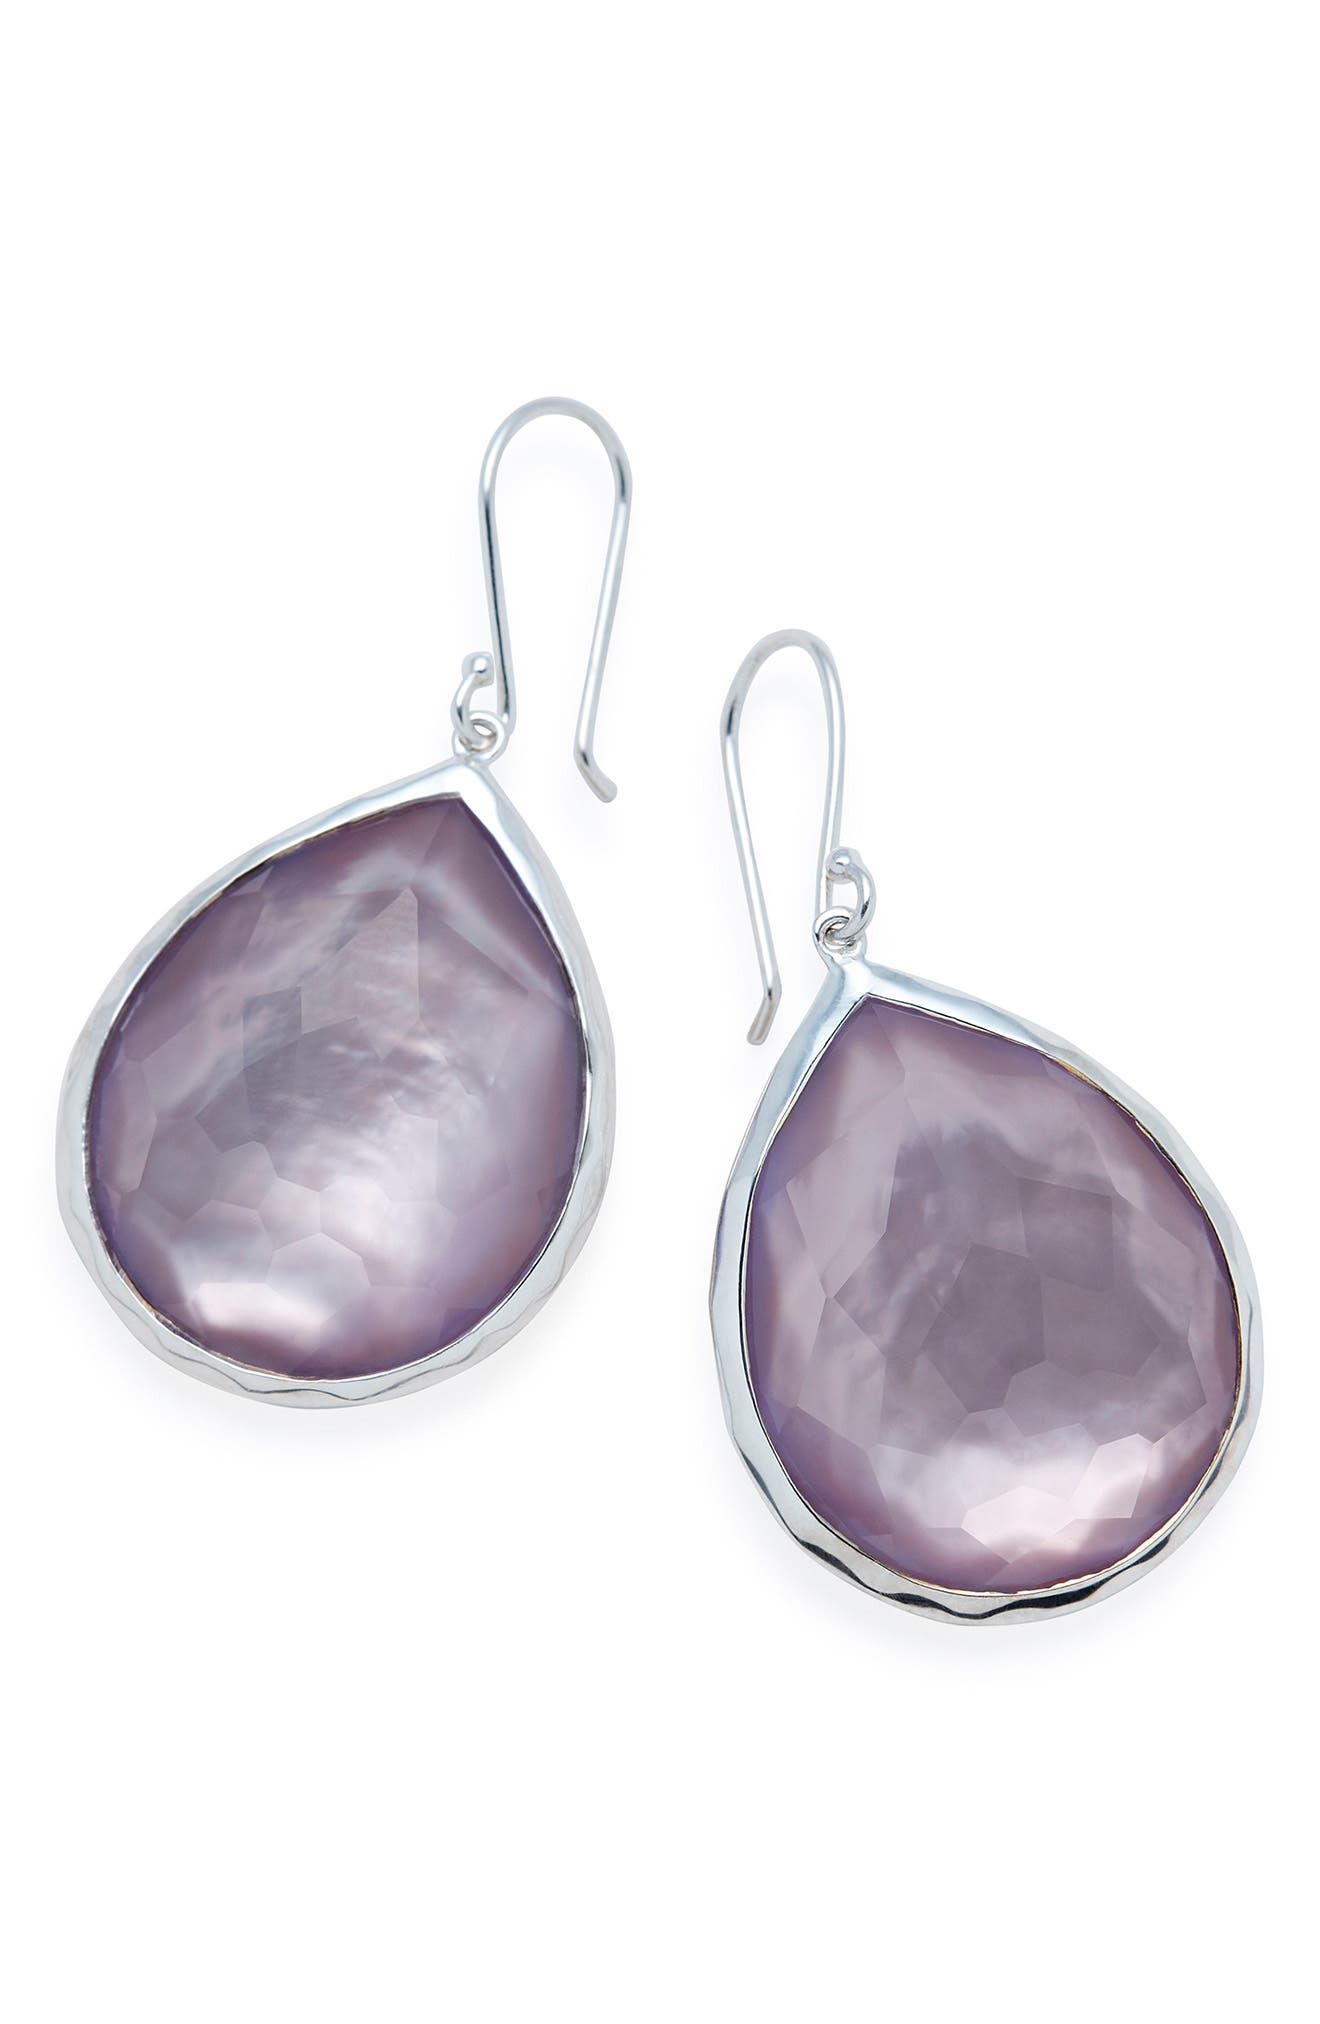 Ippolita Wonderland Large Teardrop Earrings